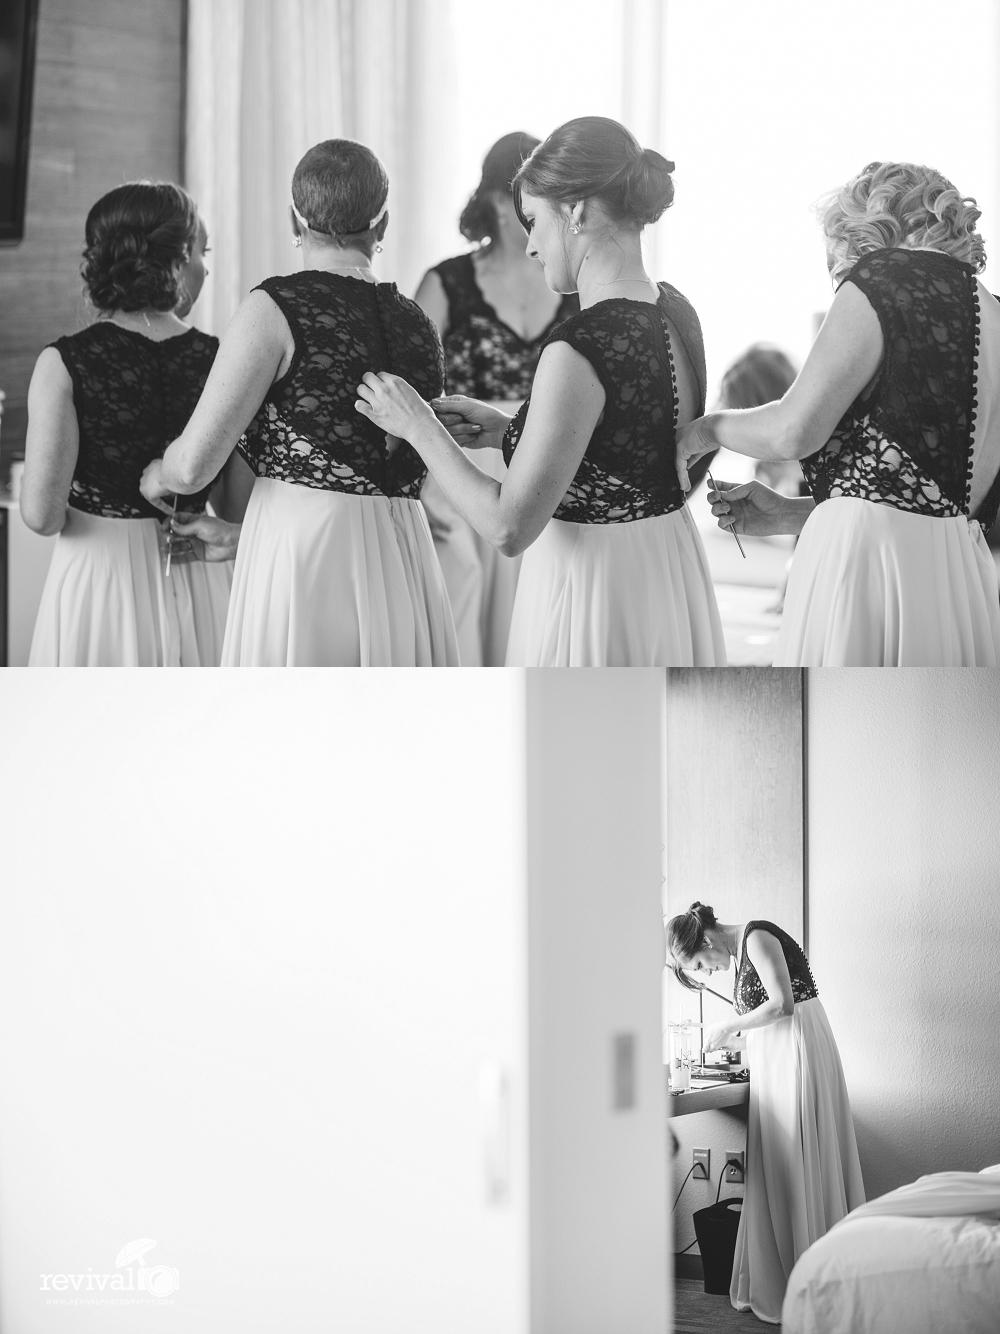 Photos by Revival Photography Asheville Weddings Crest Center and Pavilion NC Wedding Photographers www.revivalphotography.com